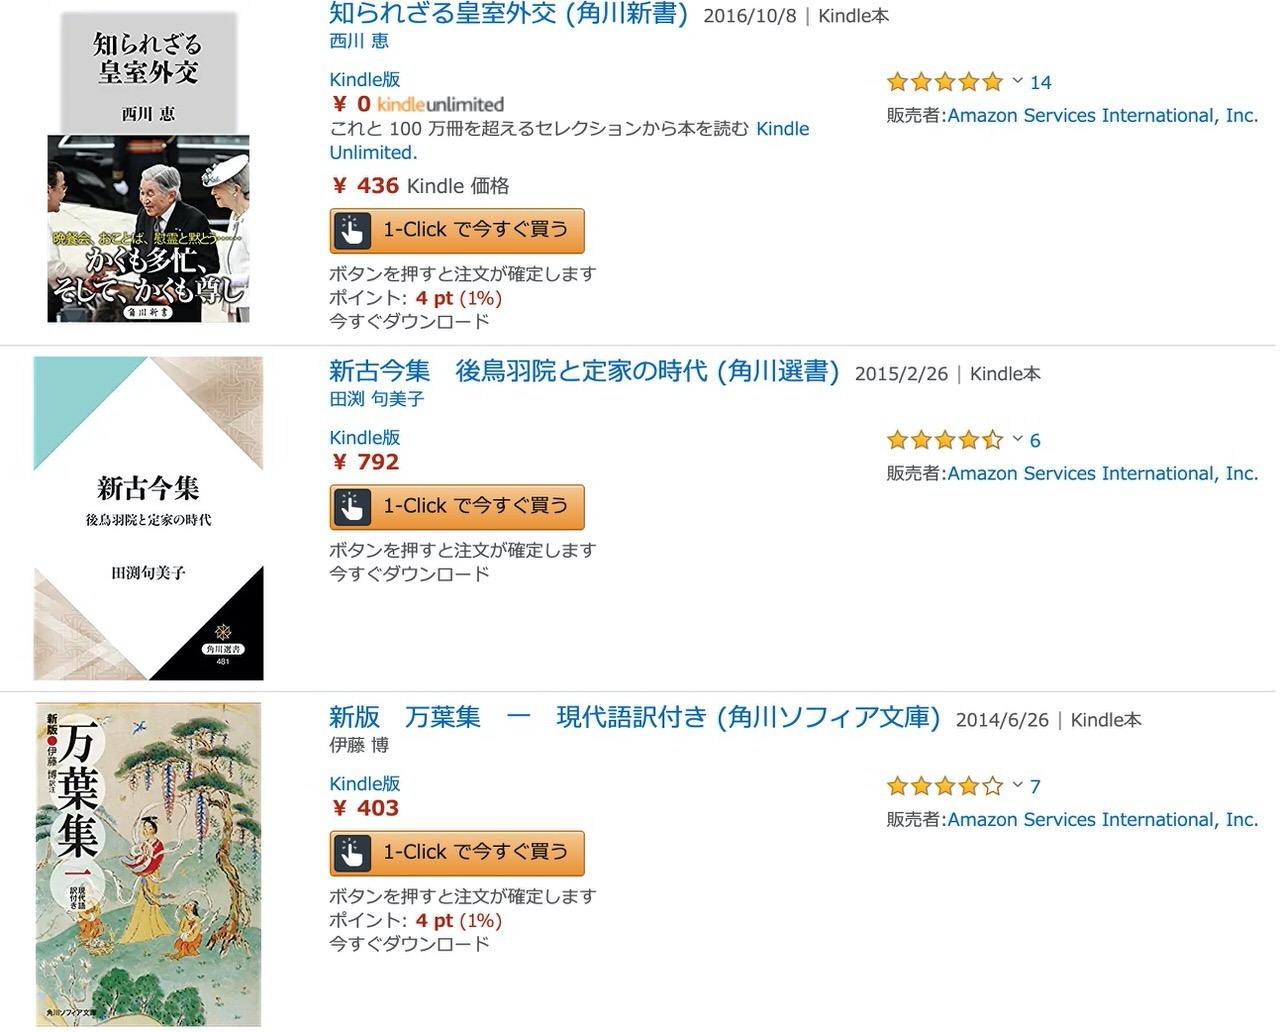 【Kindleセール】天皇の日本史、知られざる皇室外交など「皇室を知ろうフェア」(10/31まで)